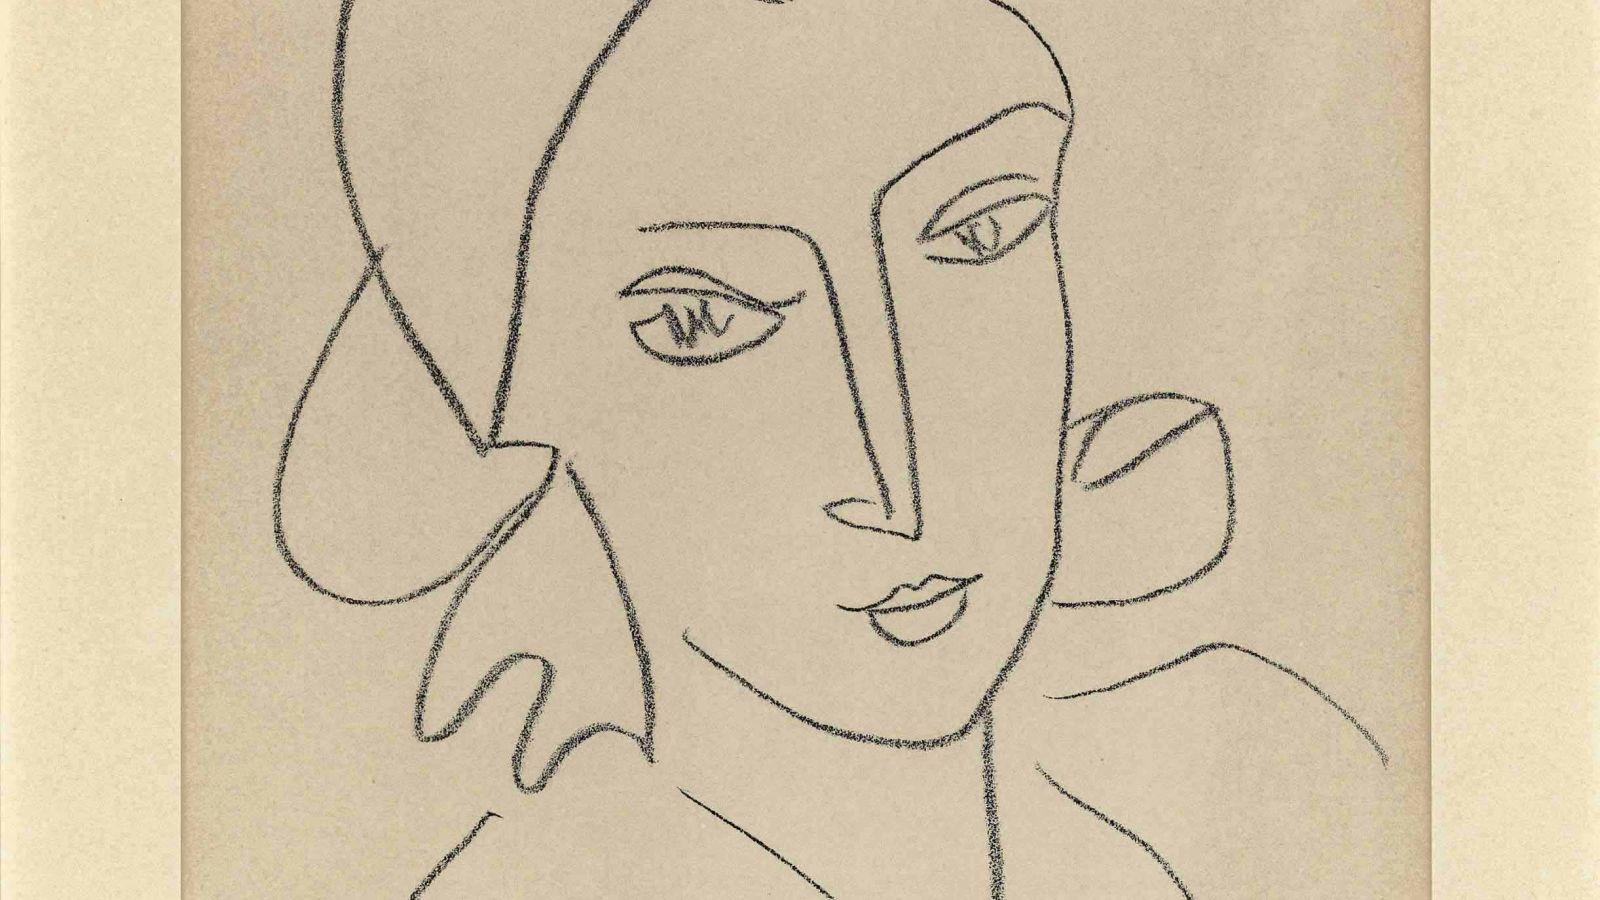 For Sale: Θέλετε έναν Matisse στο σαλόνι σας